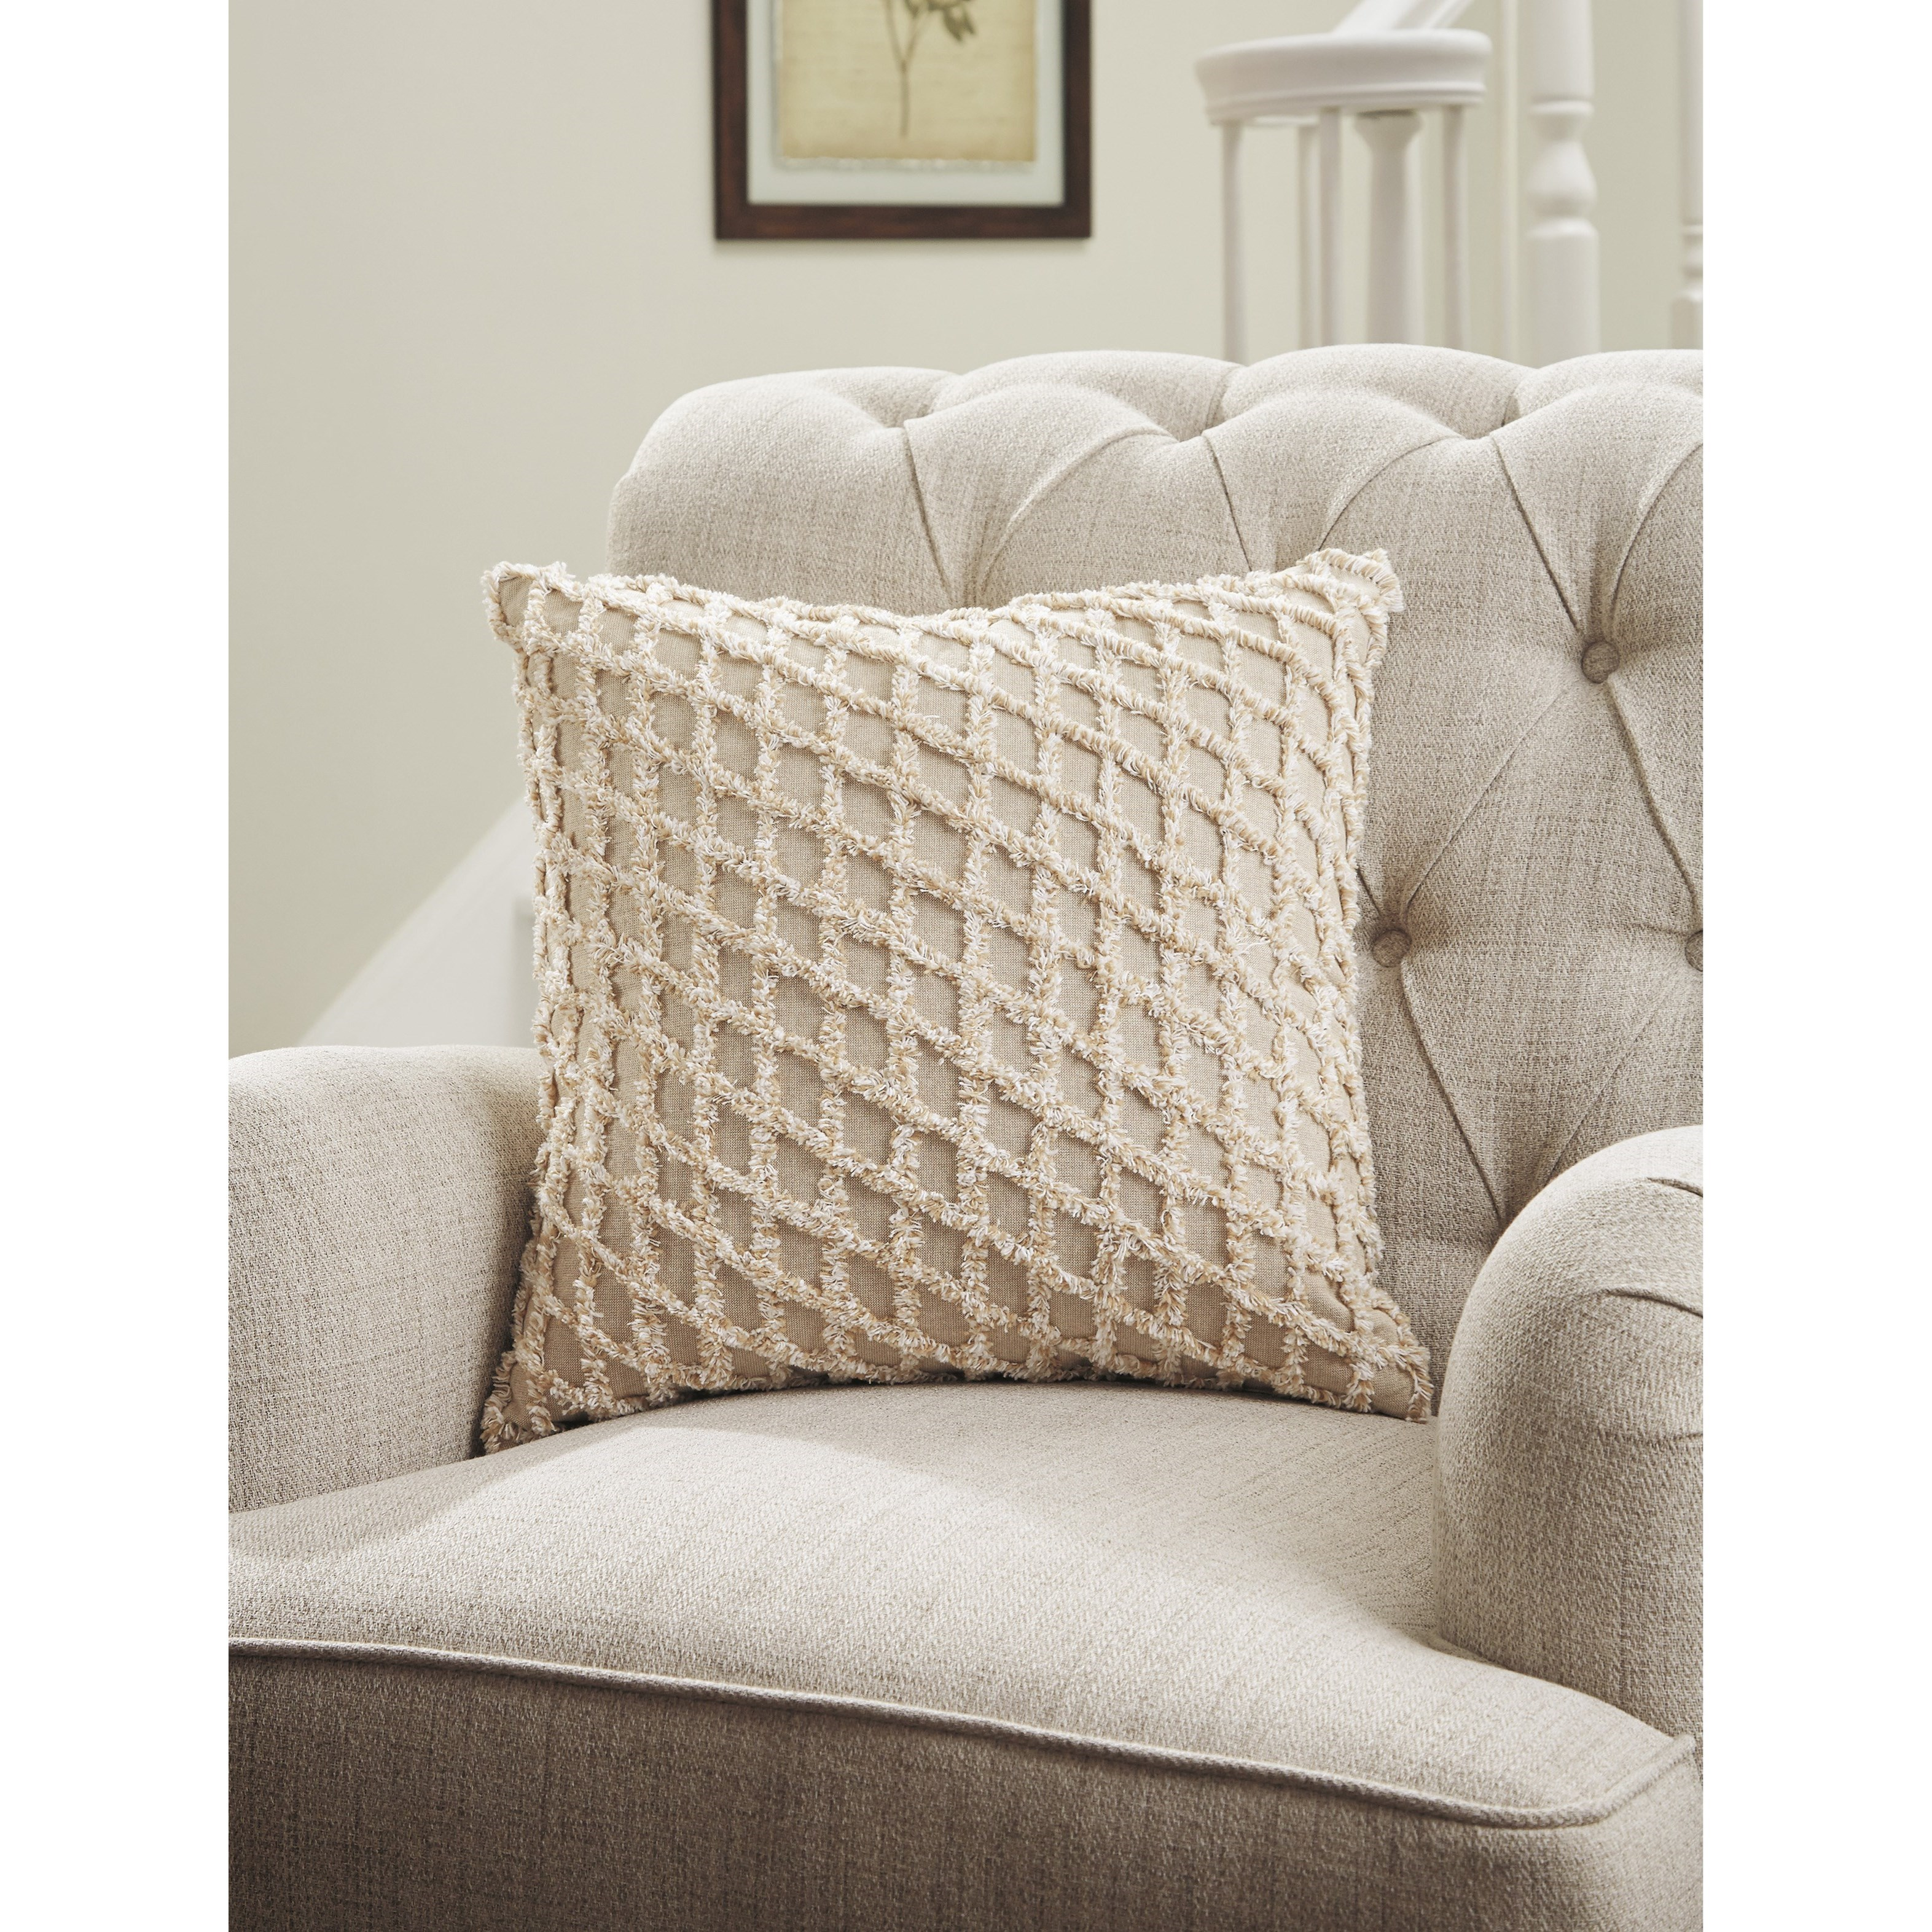 Ashley Signature Design Pillows A1000818P Mayten Tan/White